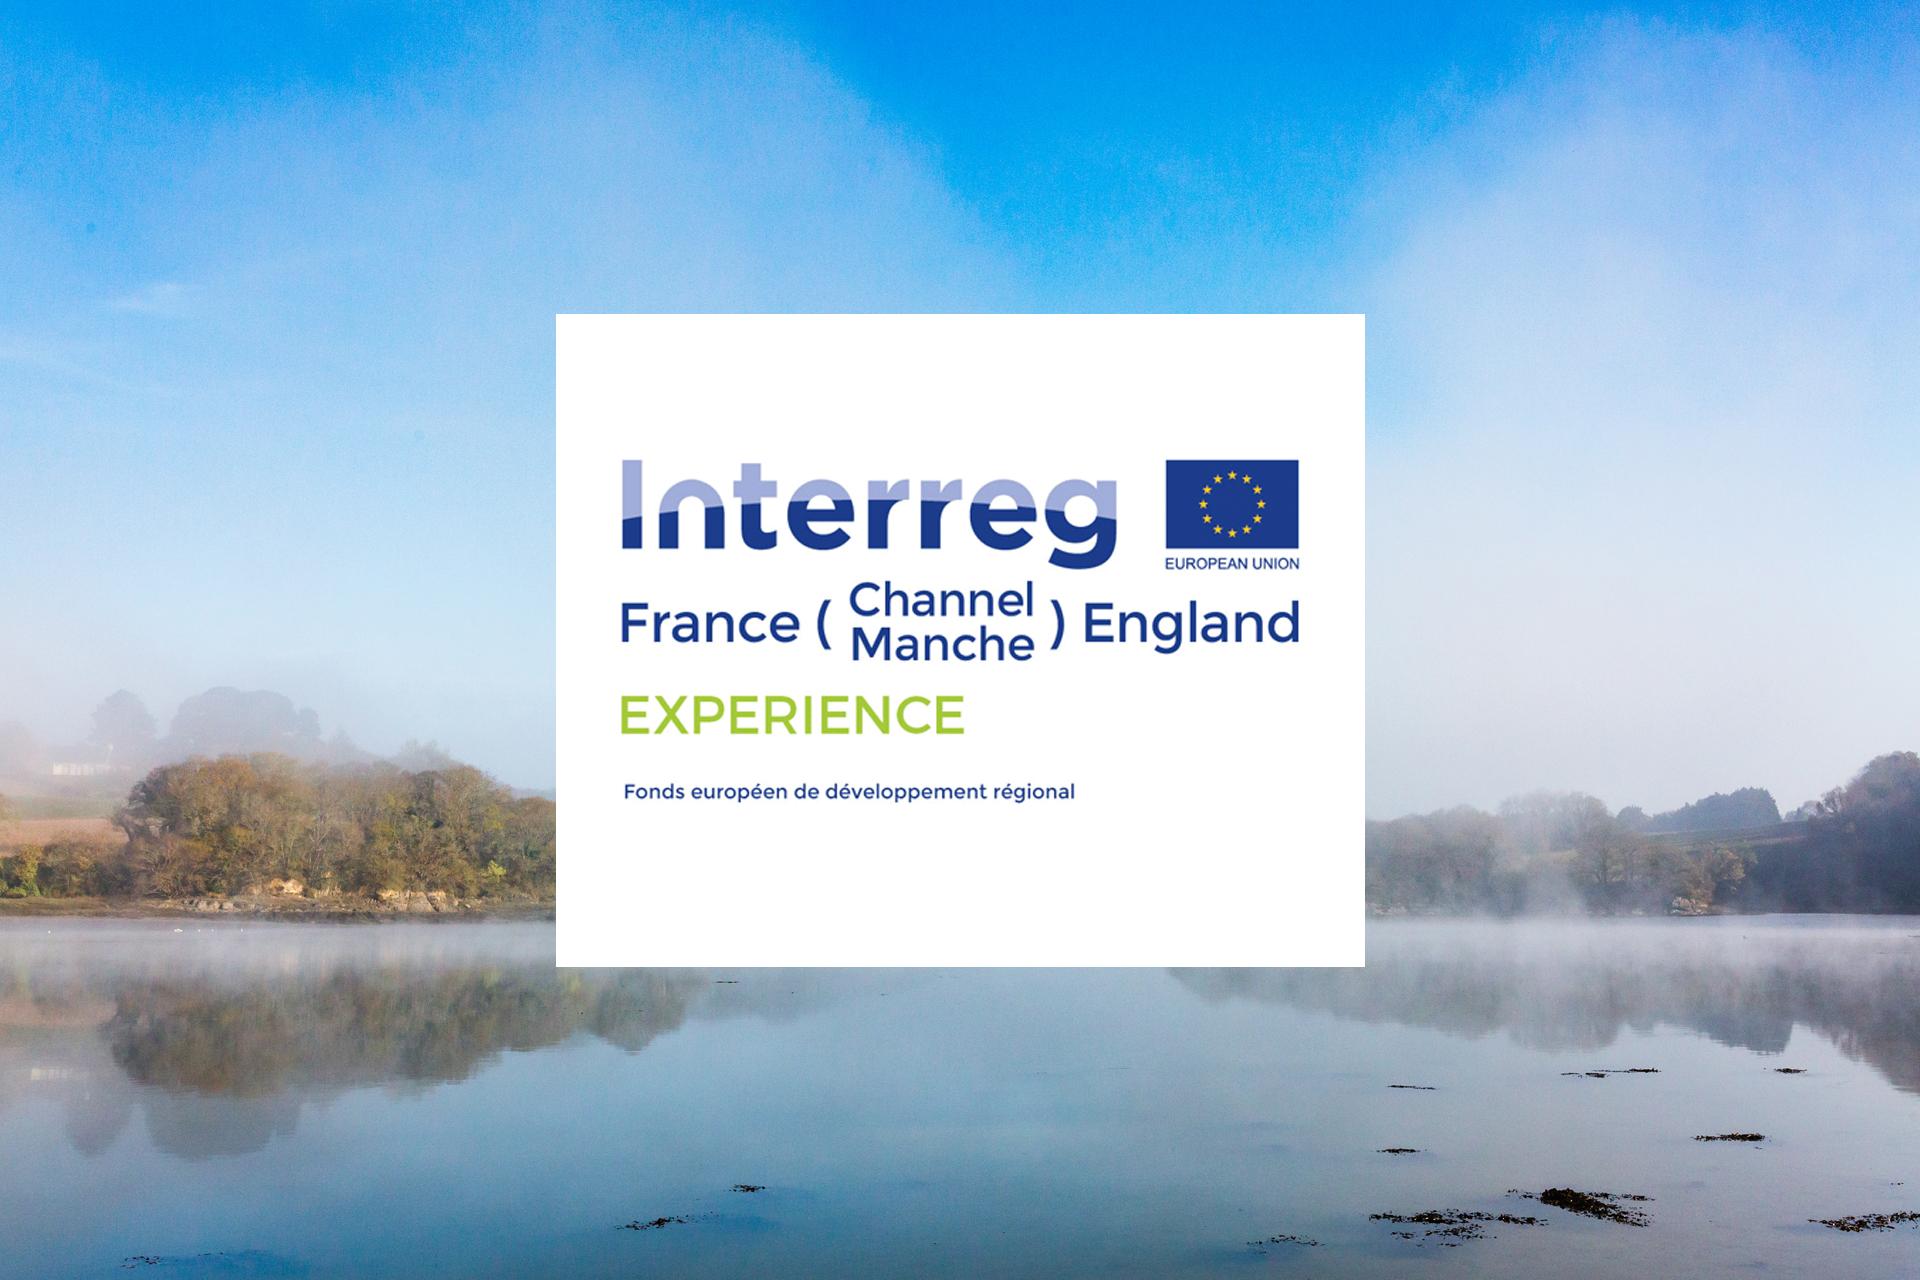 EXPERIENCE - Projet Interreg France Manche Angleterre